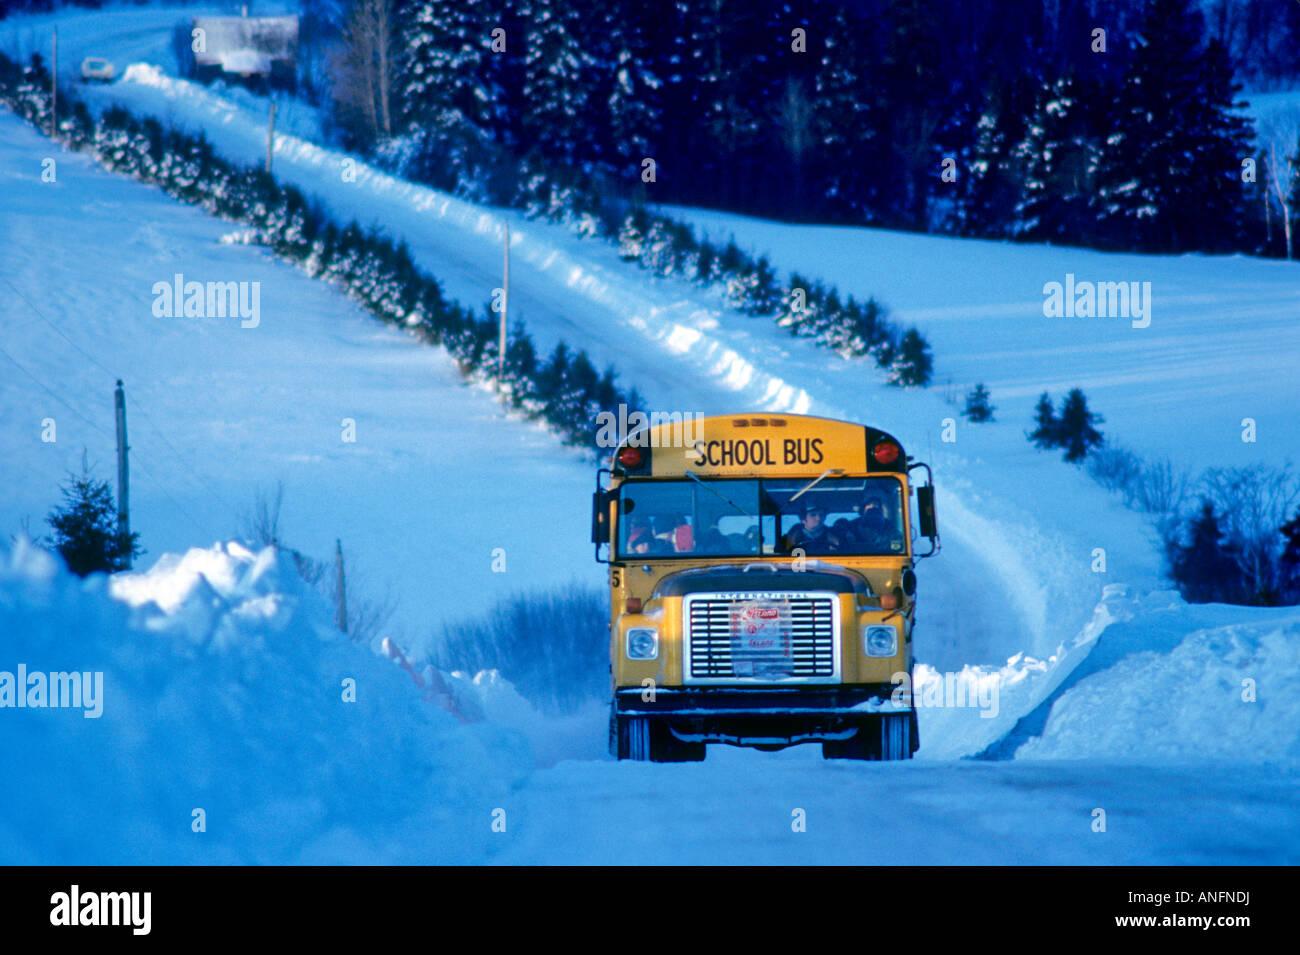 Scuola Bus a Riverdale, Prince Edward Island, Canada. Immagini Stock